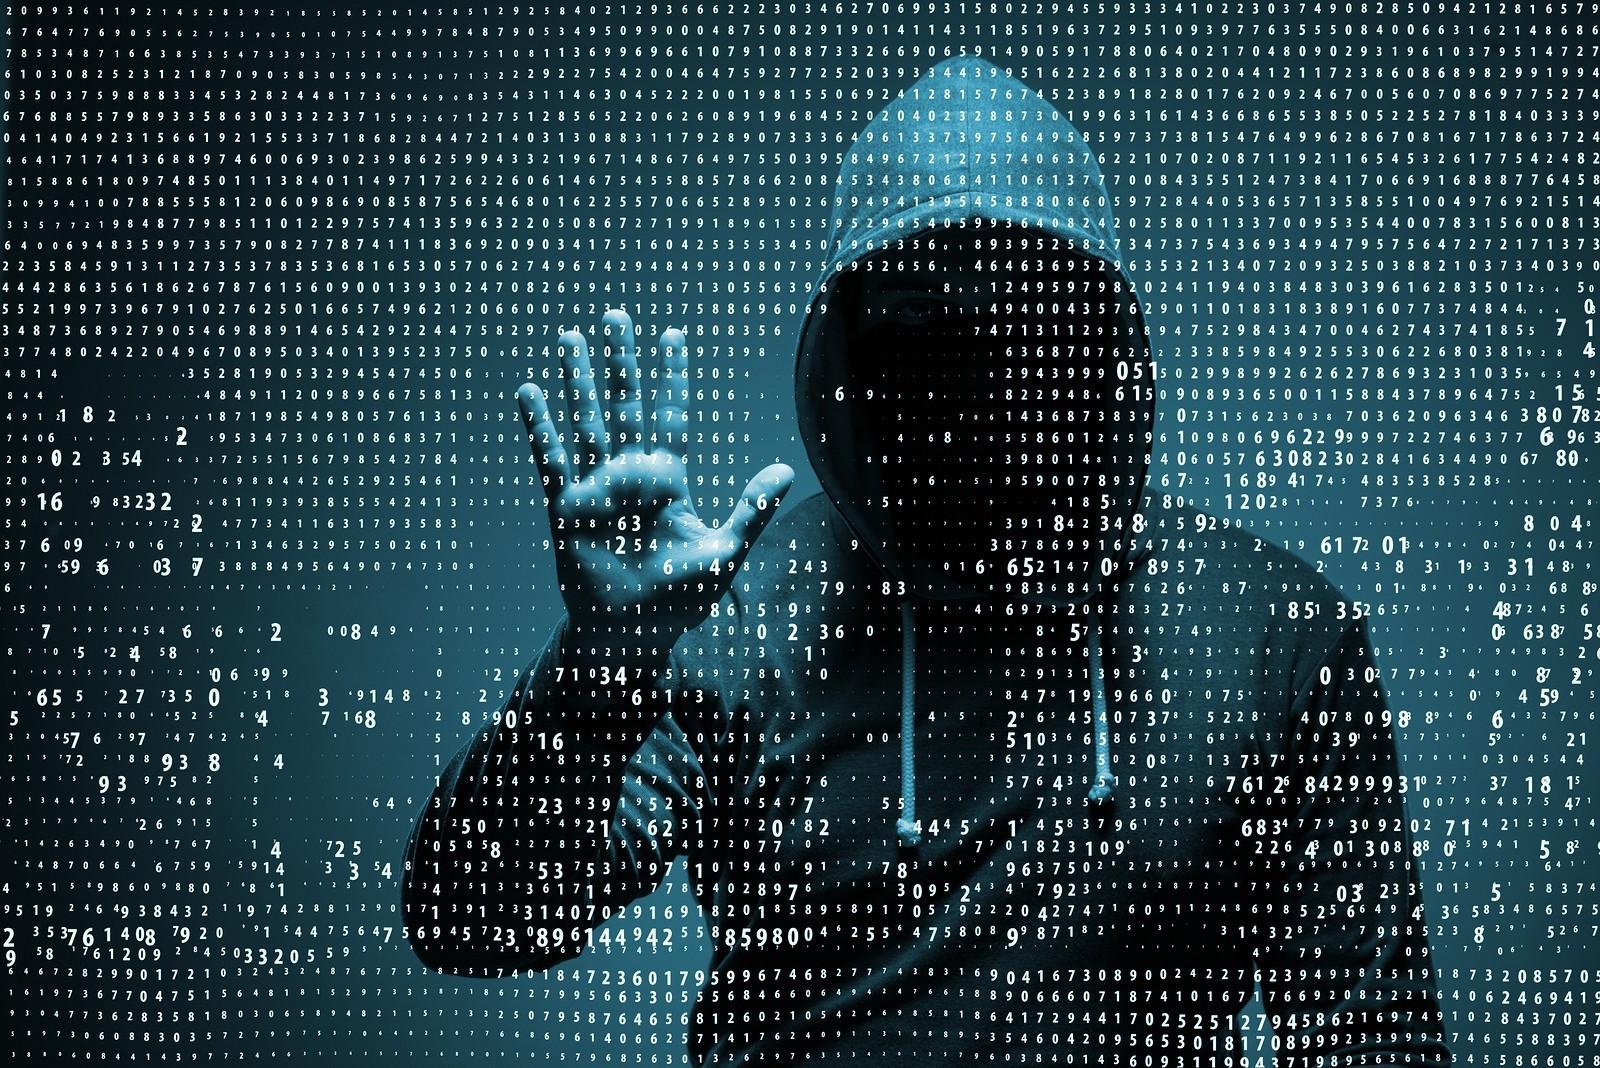 Directory Privacy ابزار قرار دادن رمز روی پوشه ها